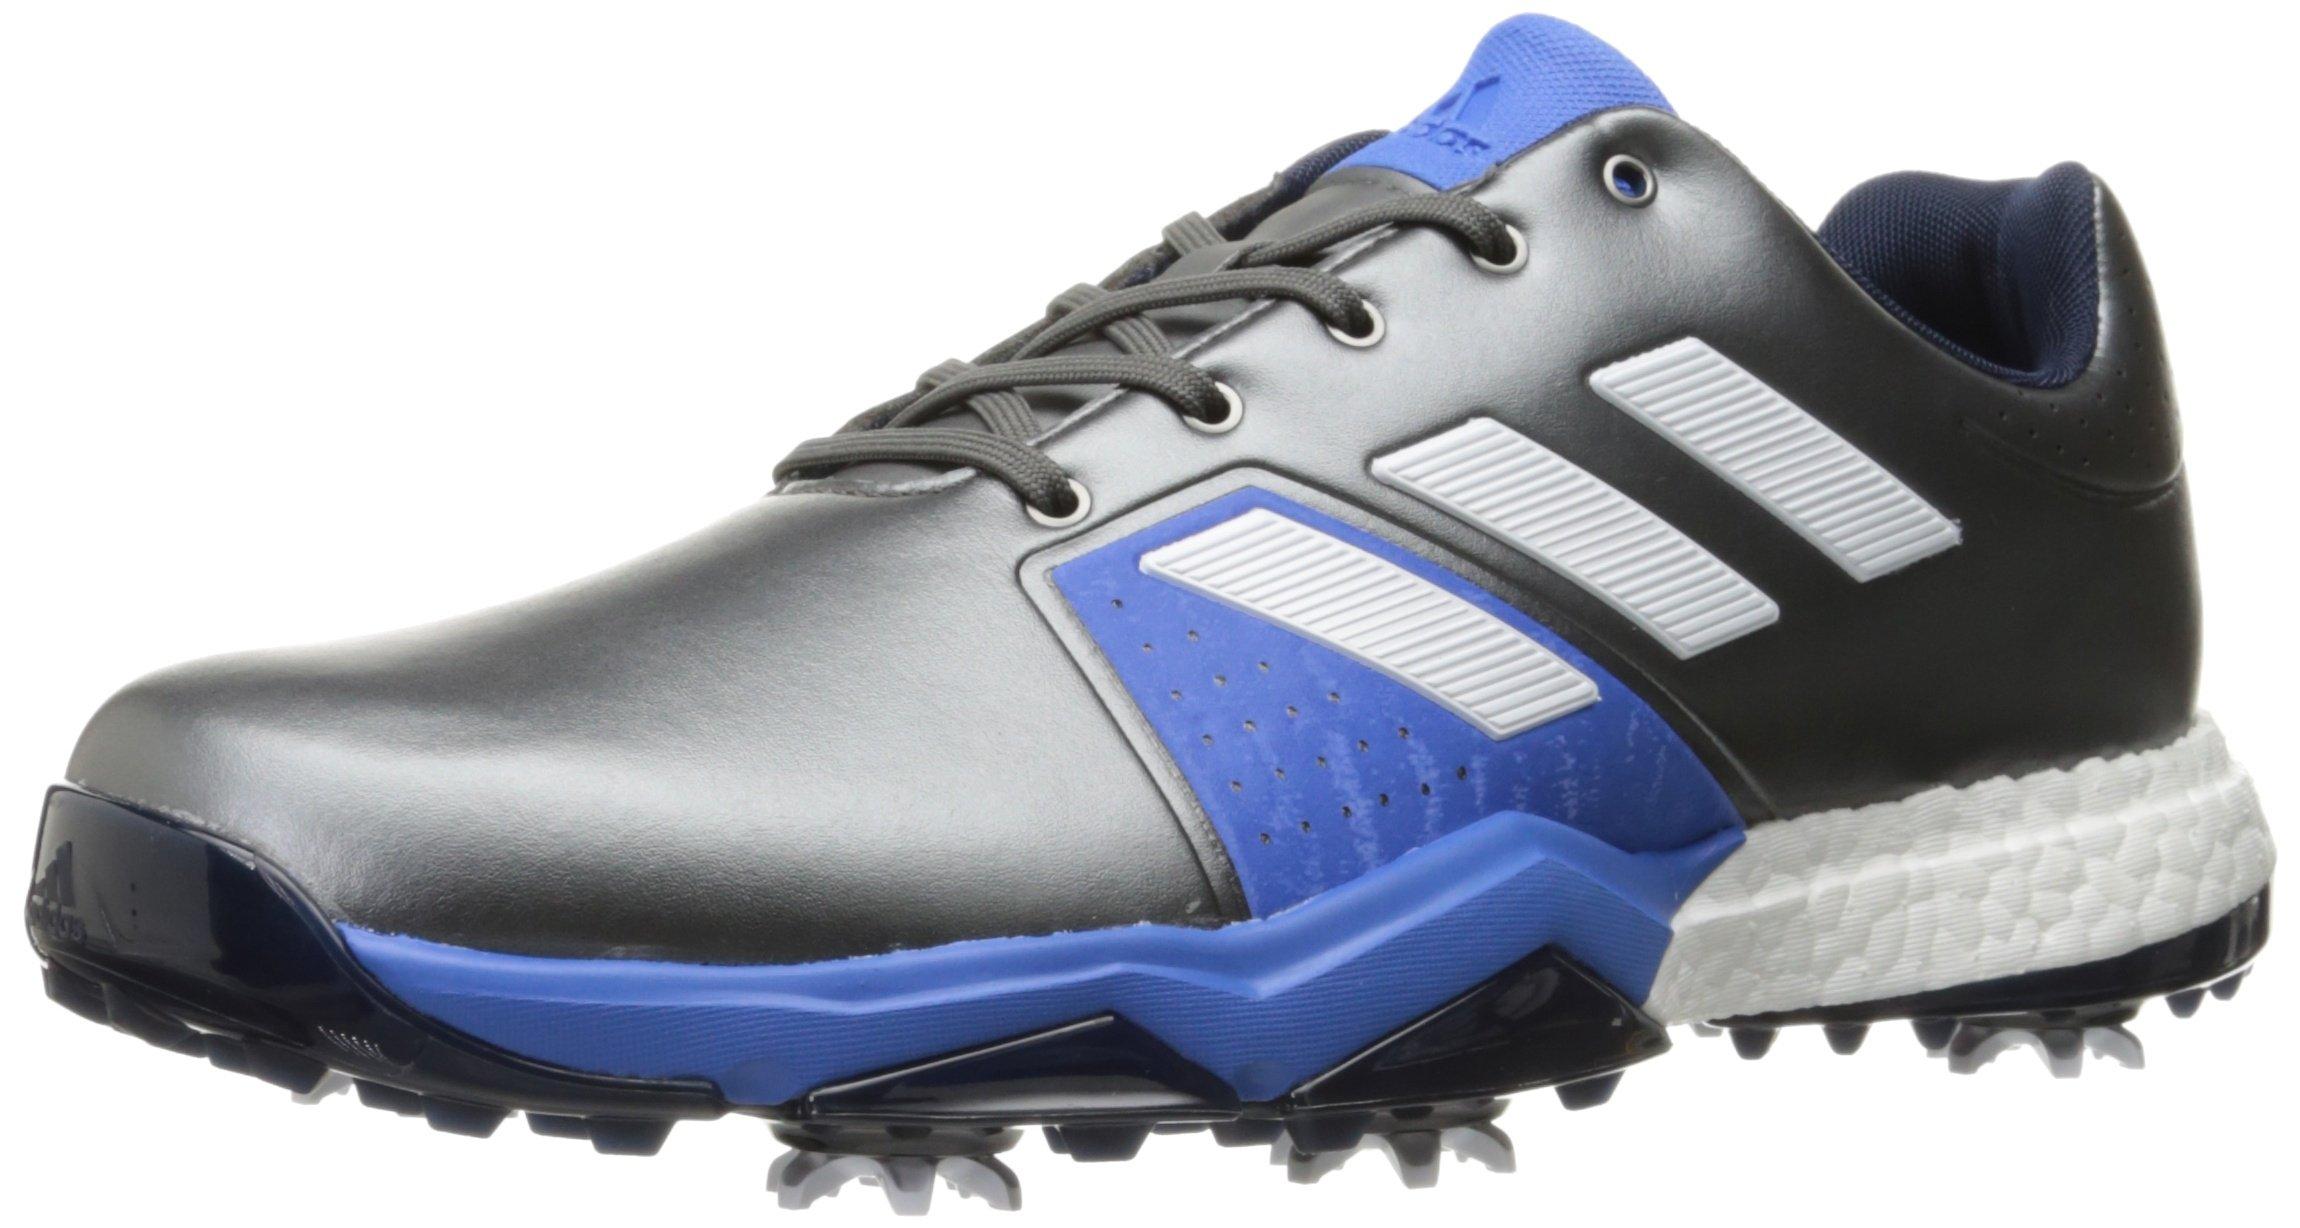 adidas Men's Adipower Boost 3 Golf Shoe, Dark Silver Metallic/White/Blast Blue, 8 M US